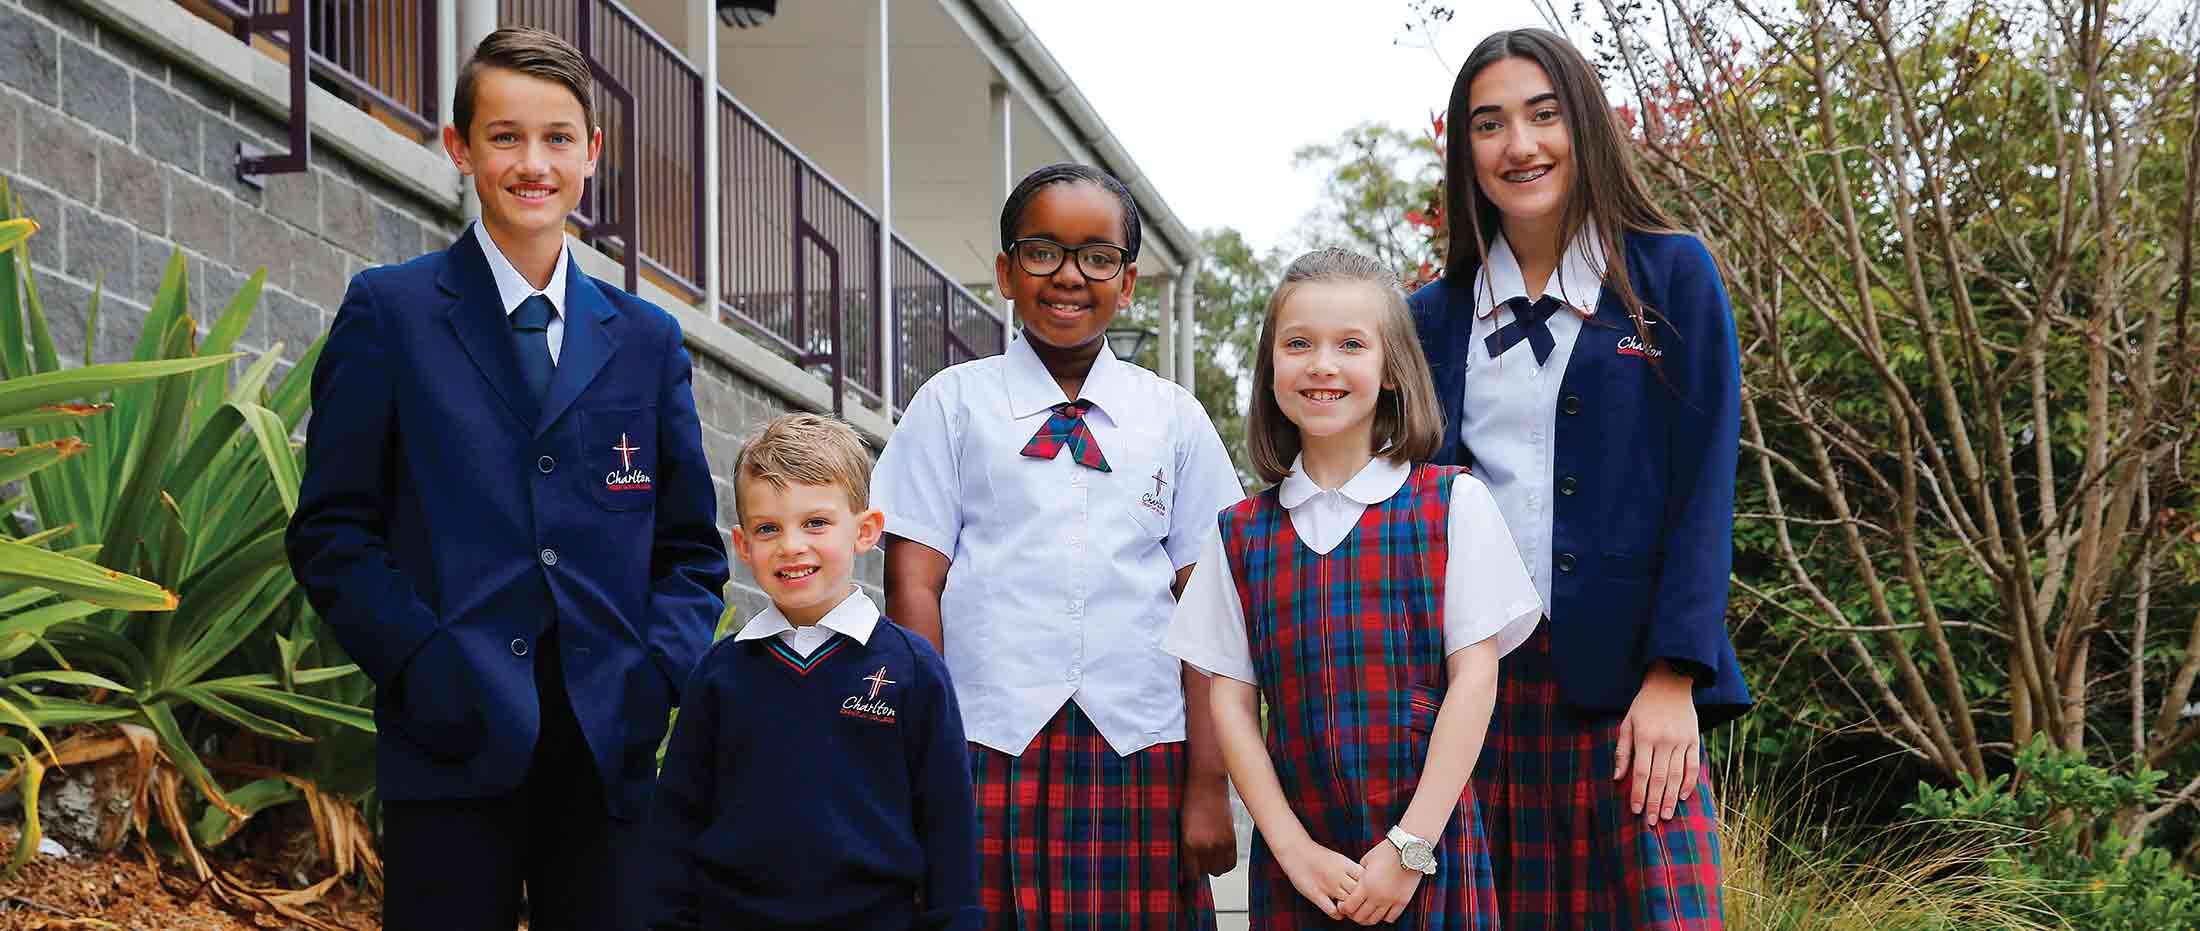 school uniform charlton christian college